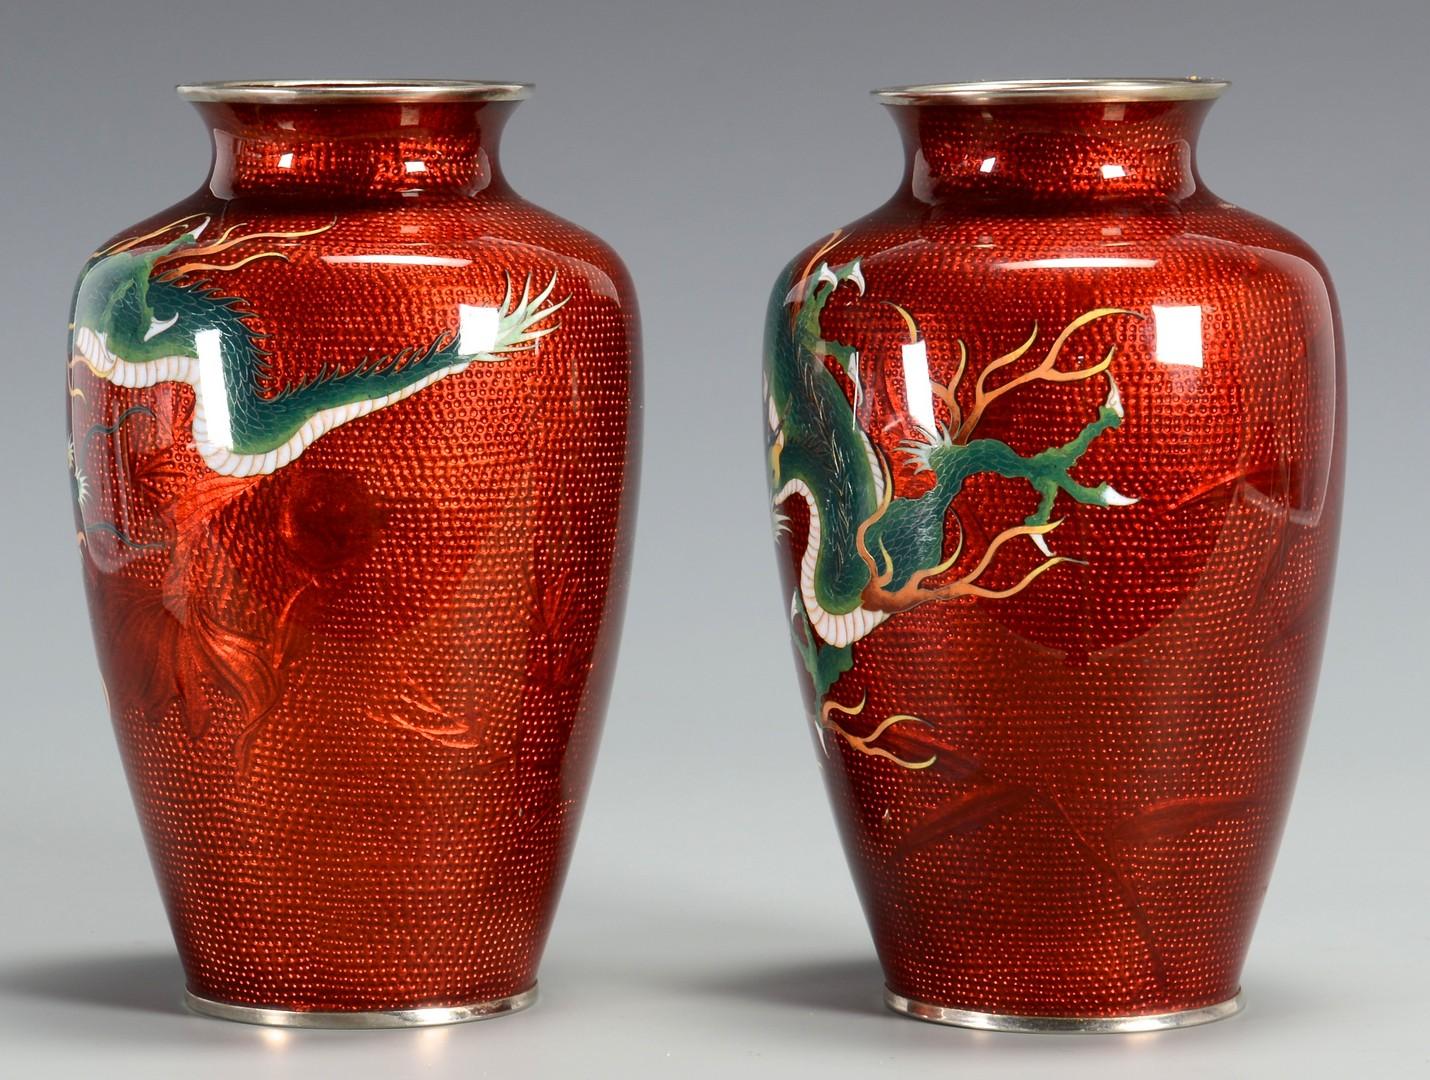 Lot 3594197: Pr. Japanese Sato Cloisonne Vases